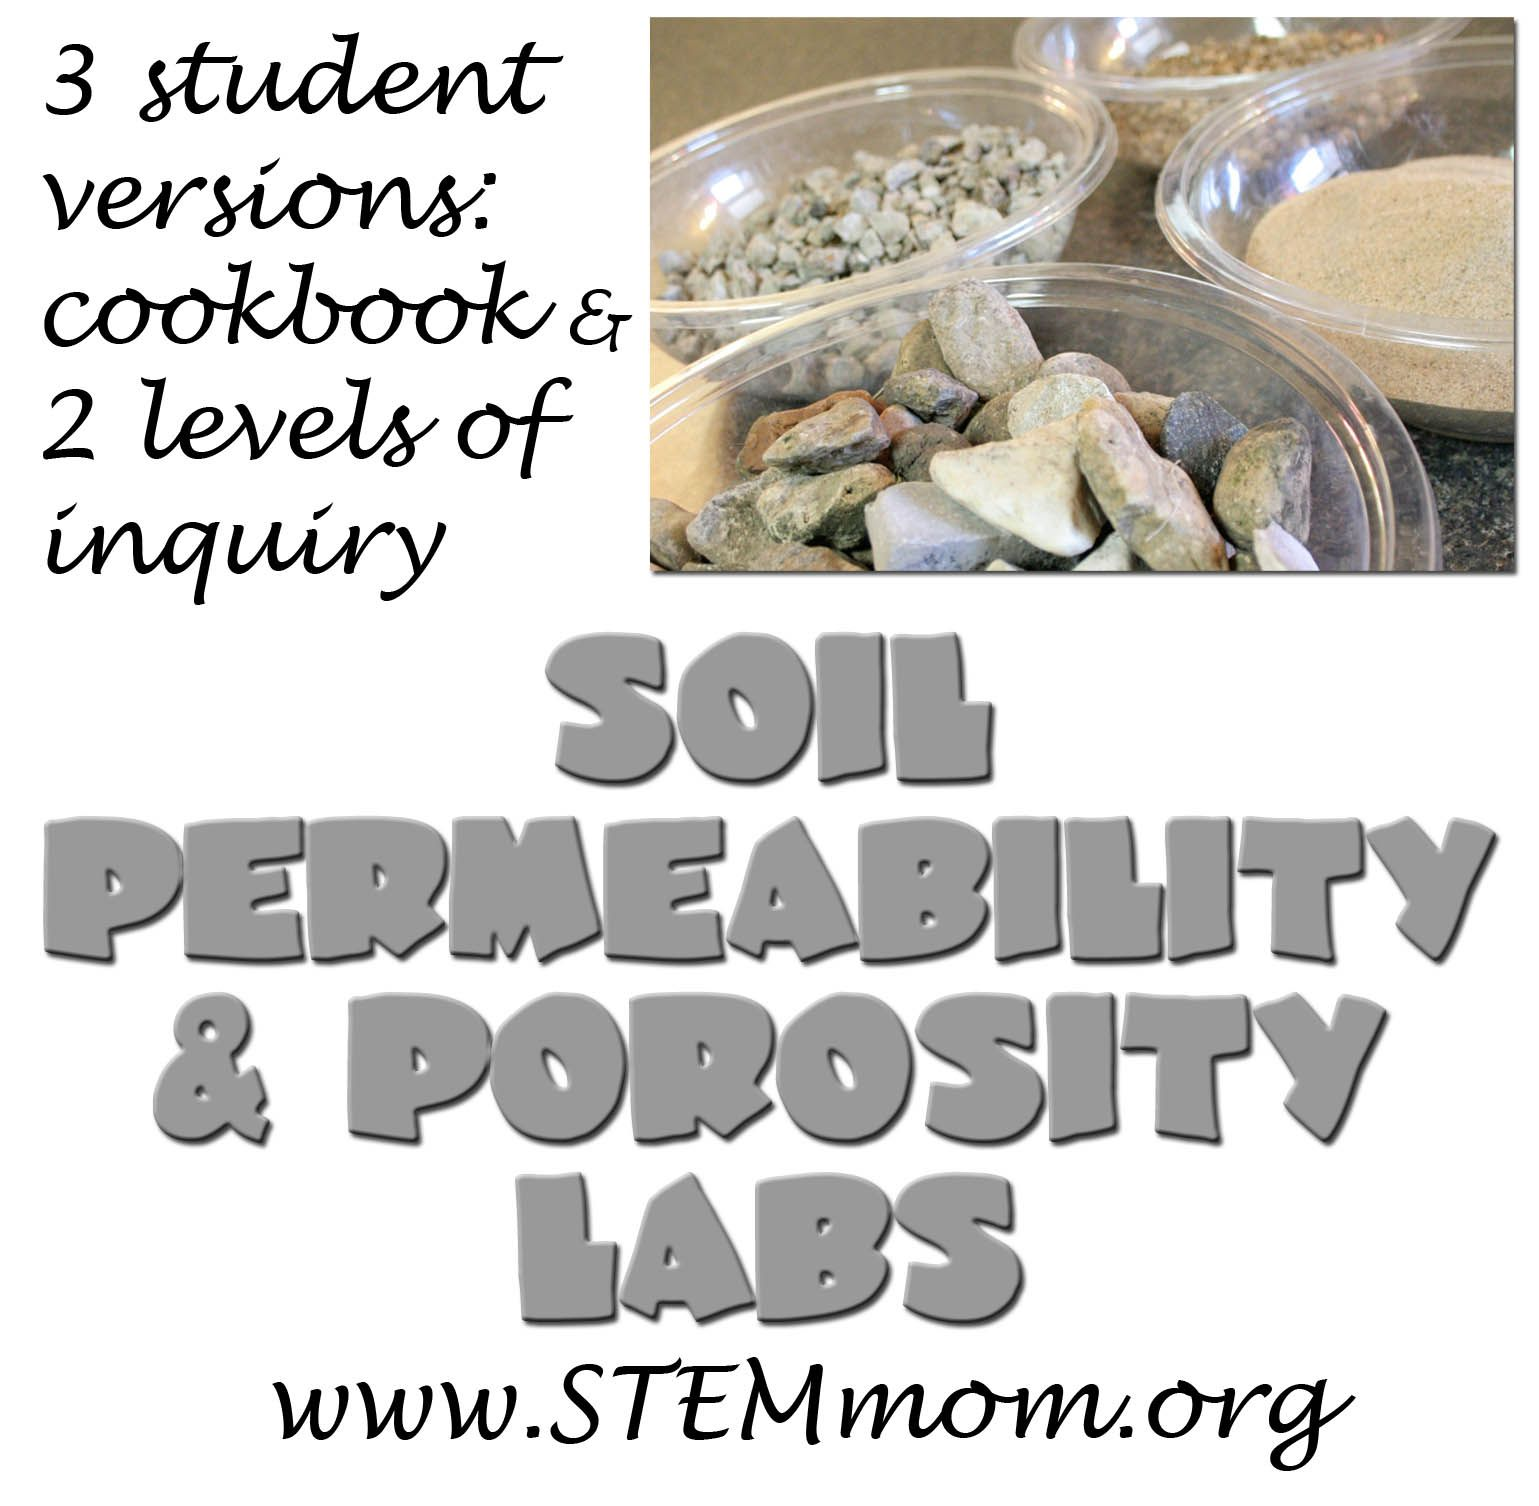 Soil Permeability And Porosity Lab